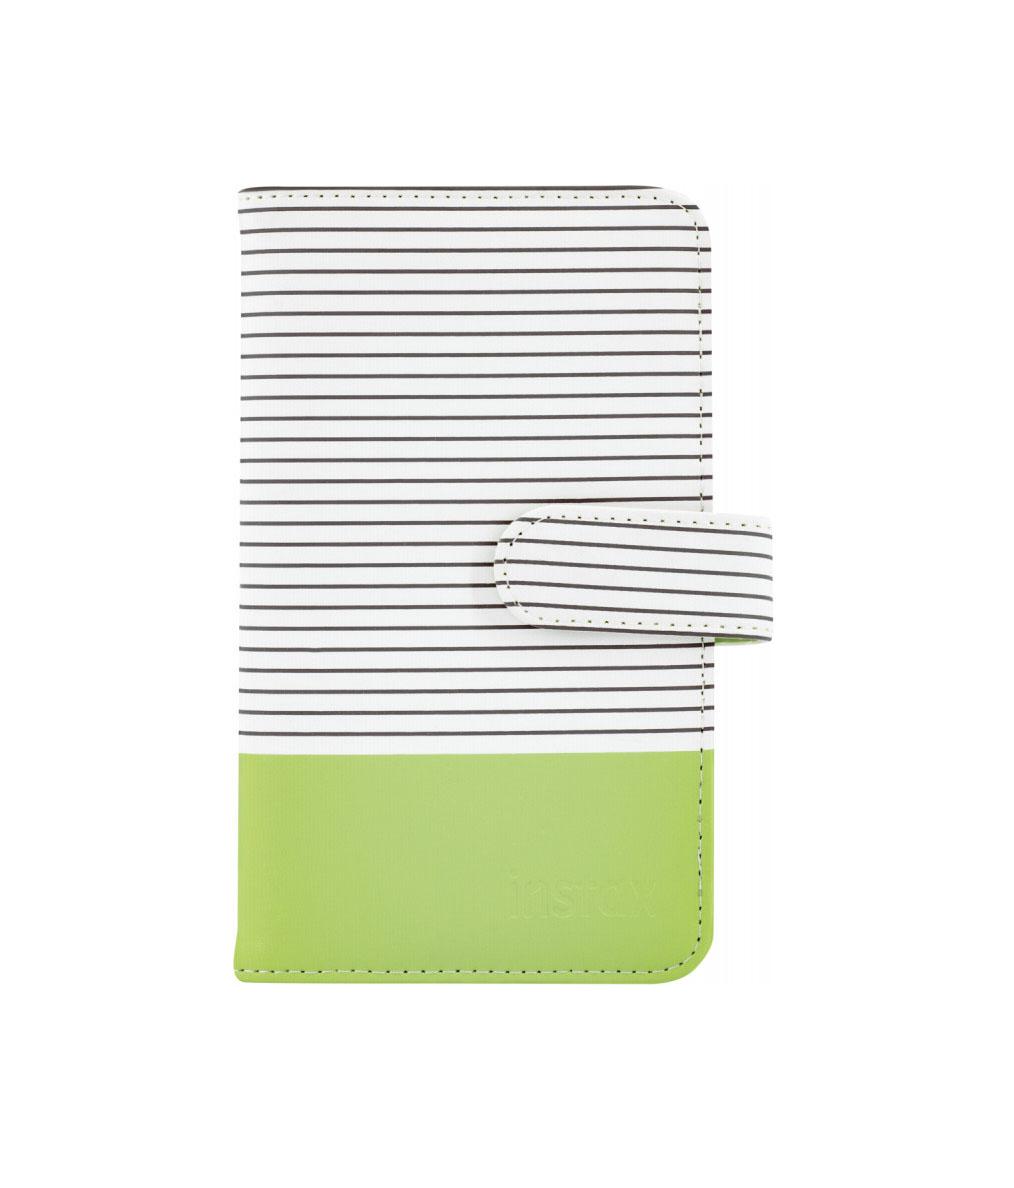 Fujifilm Instax Mini 9 Striped Album Lime Green 108 photos 70100139060 Φωτογράφικο Άλμπουμ